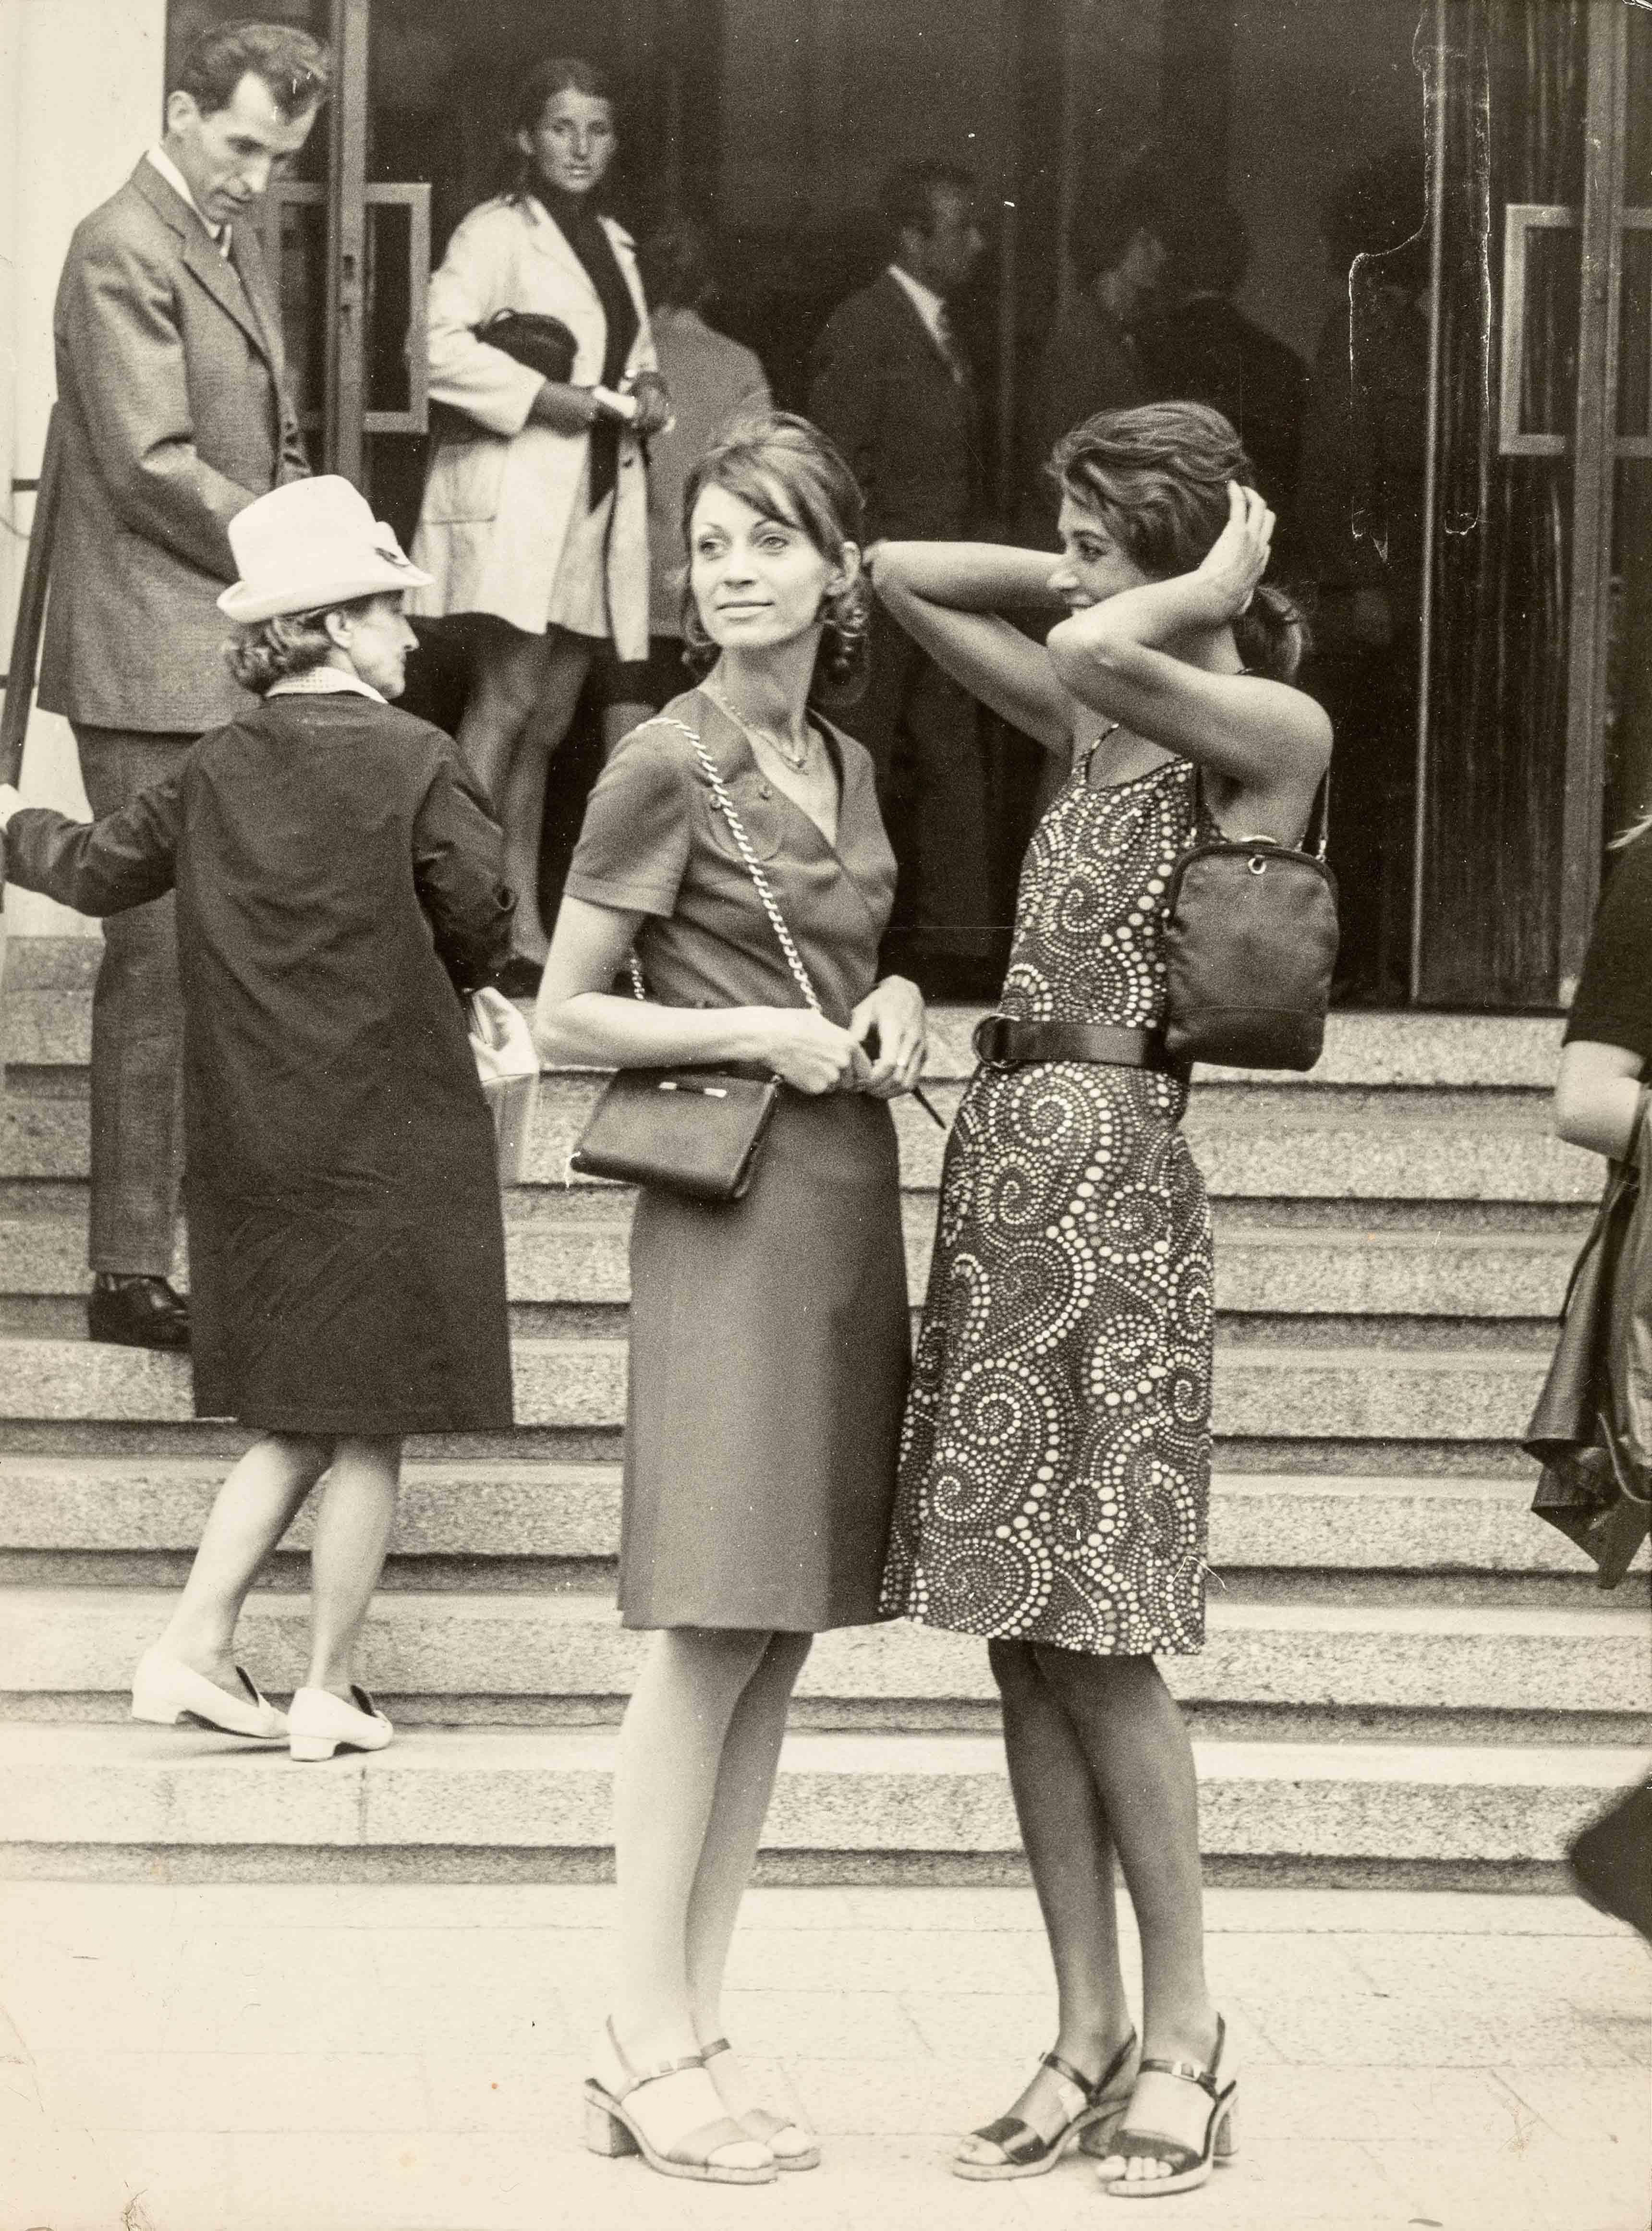 Festive dresses | vintage print | 15,6 x 11,8 in | models: German Fashion Institute | 'Sibylle', issue 6, 1971 Galerie Berinson, Berlin